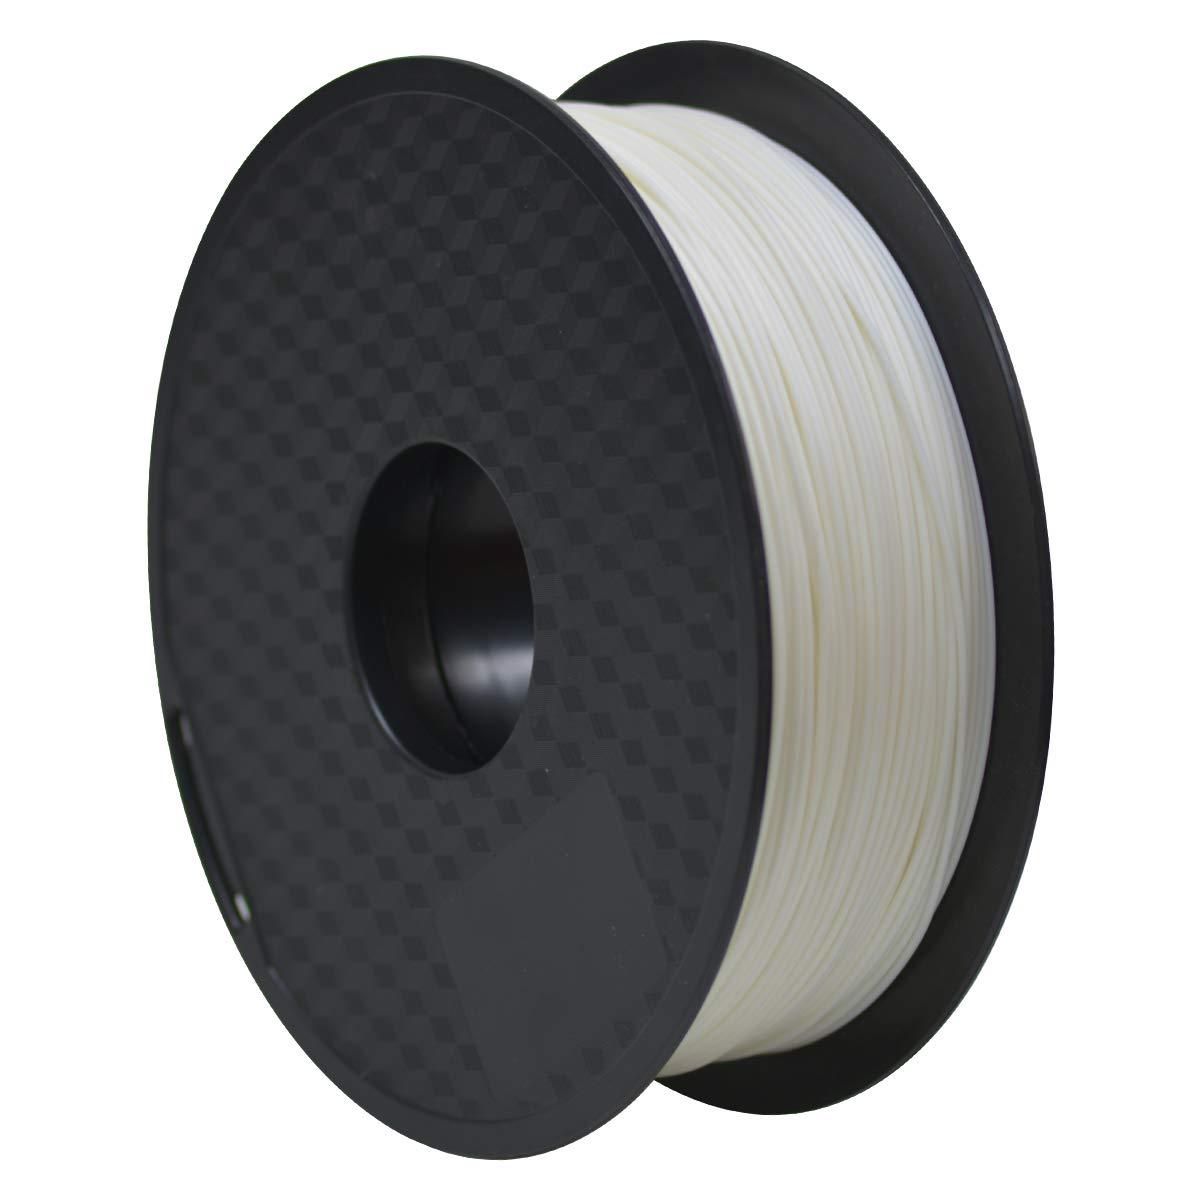 GEEETECH ABS Filamento 1.75mm Blanco, Impresora 3d Filamento 1KG 1 Carrete